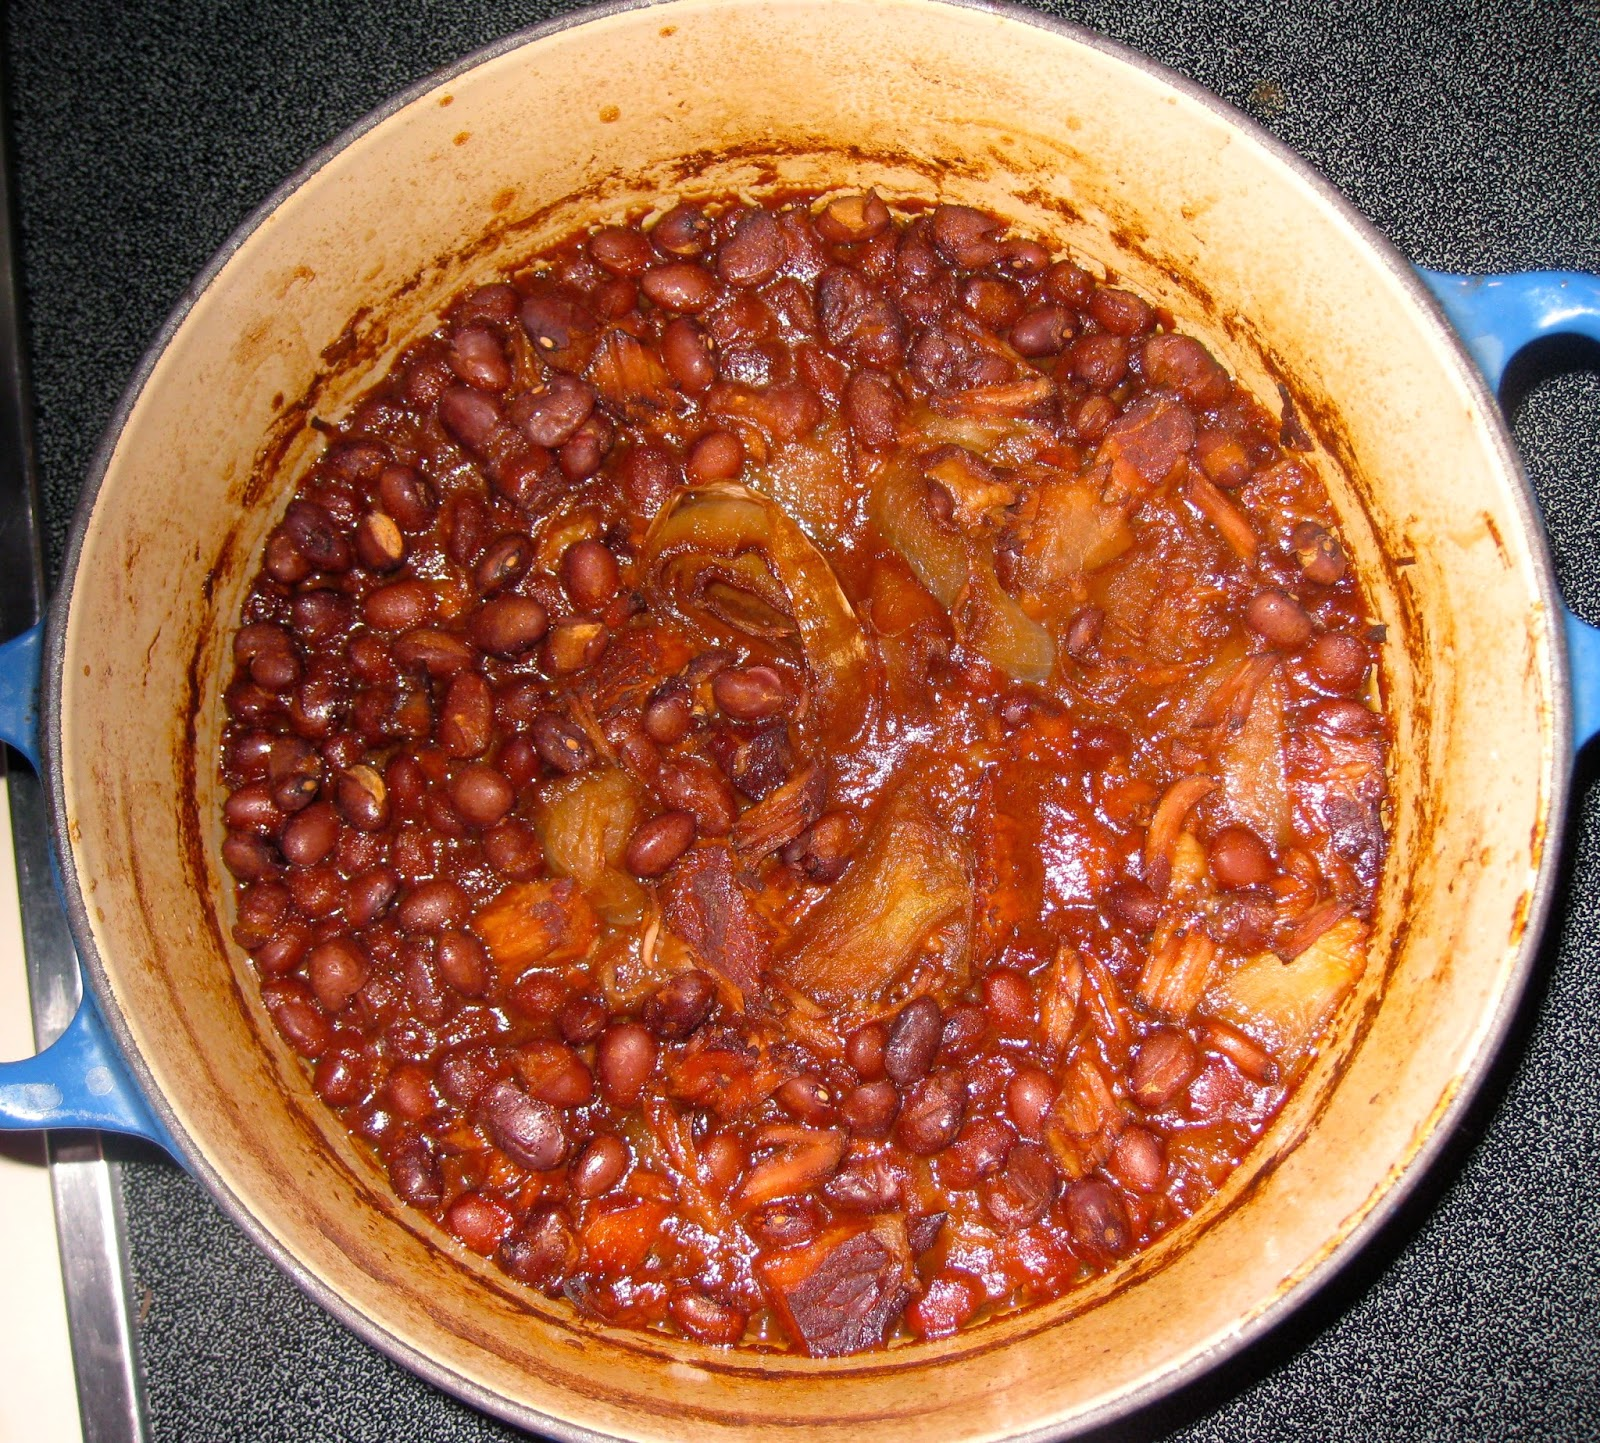 Bang Up 4th Of July Baked Beans